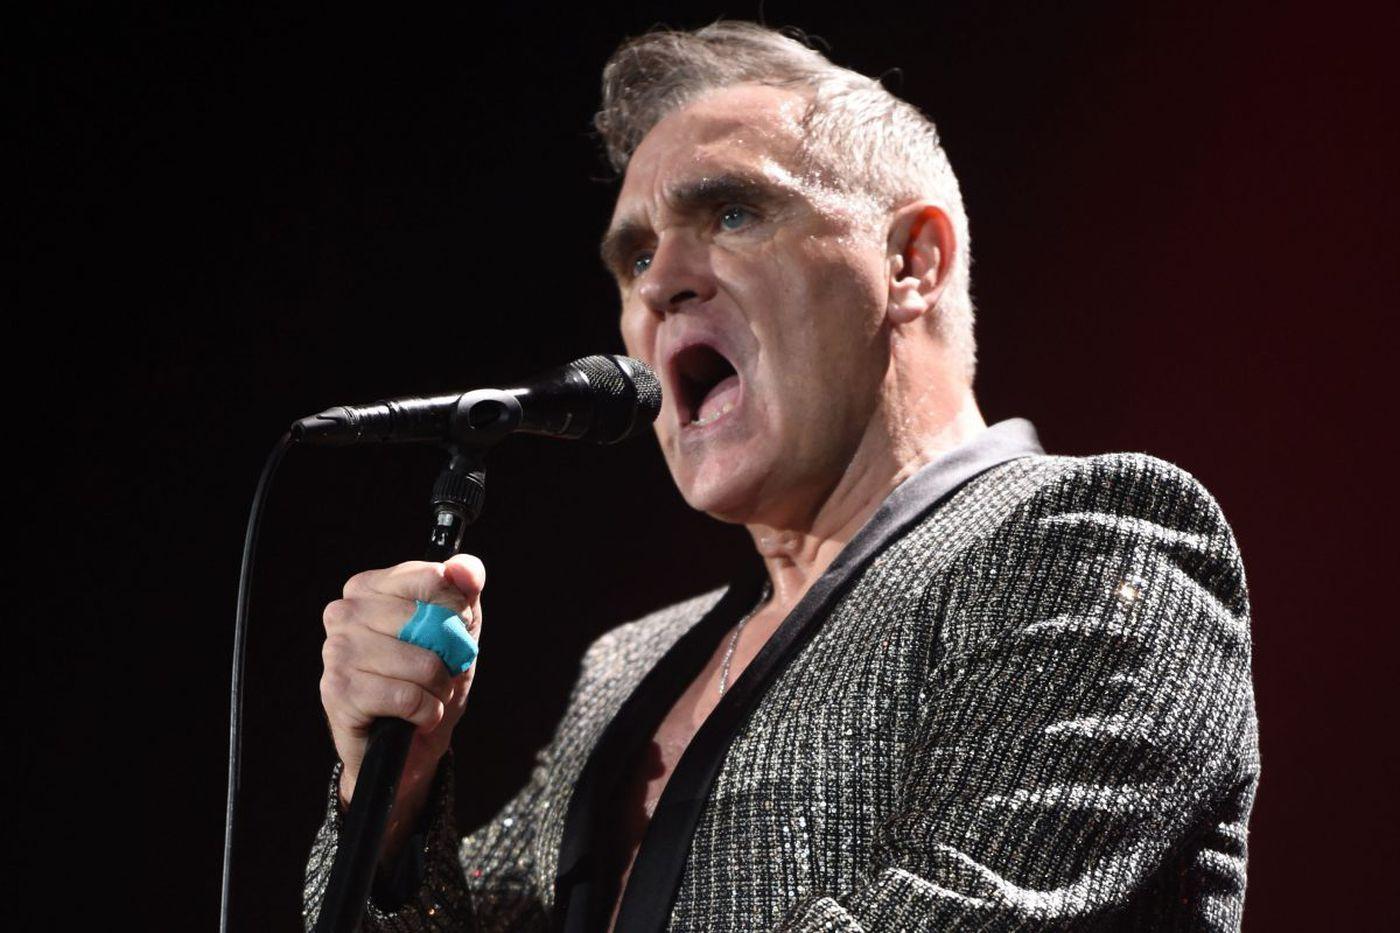 Here's a shocker: Morrissey's Fillmore concert has been postponed